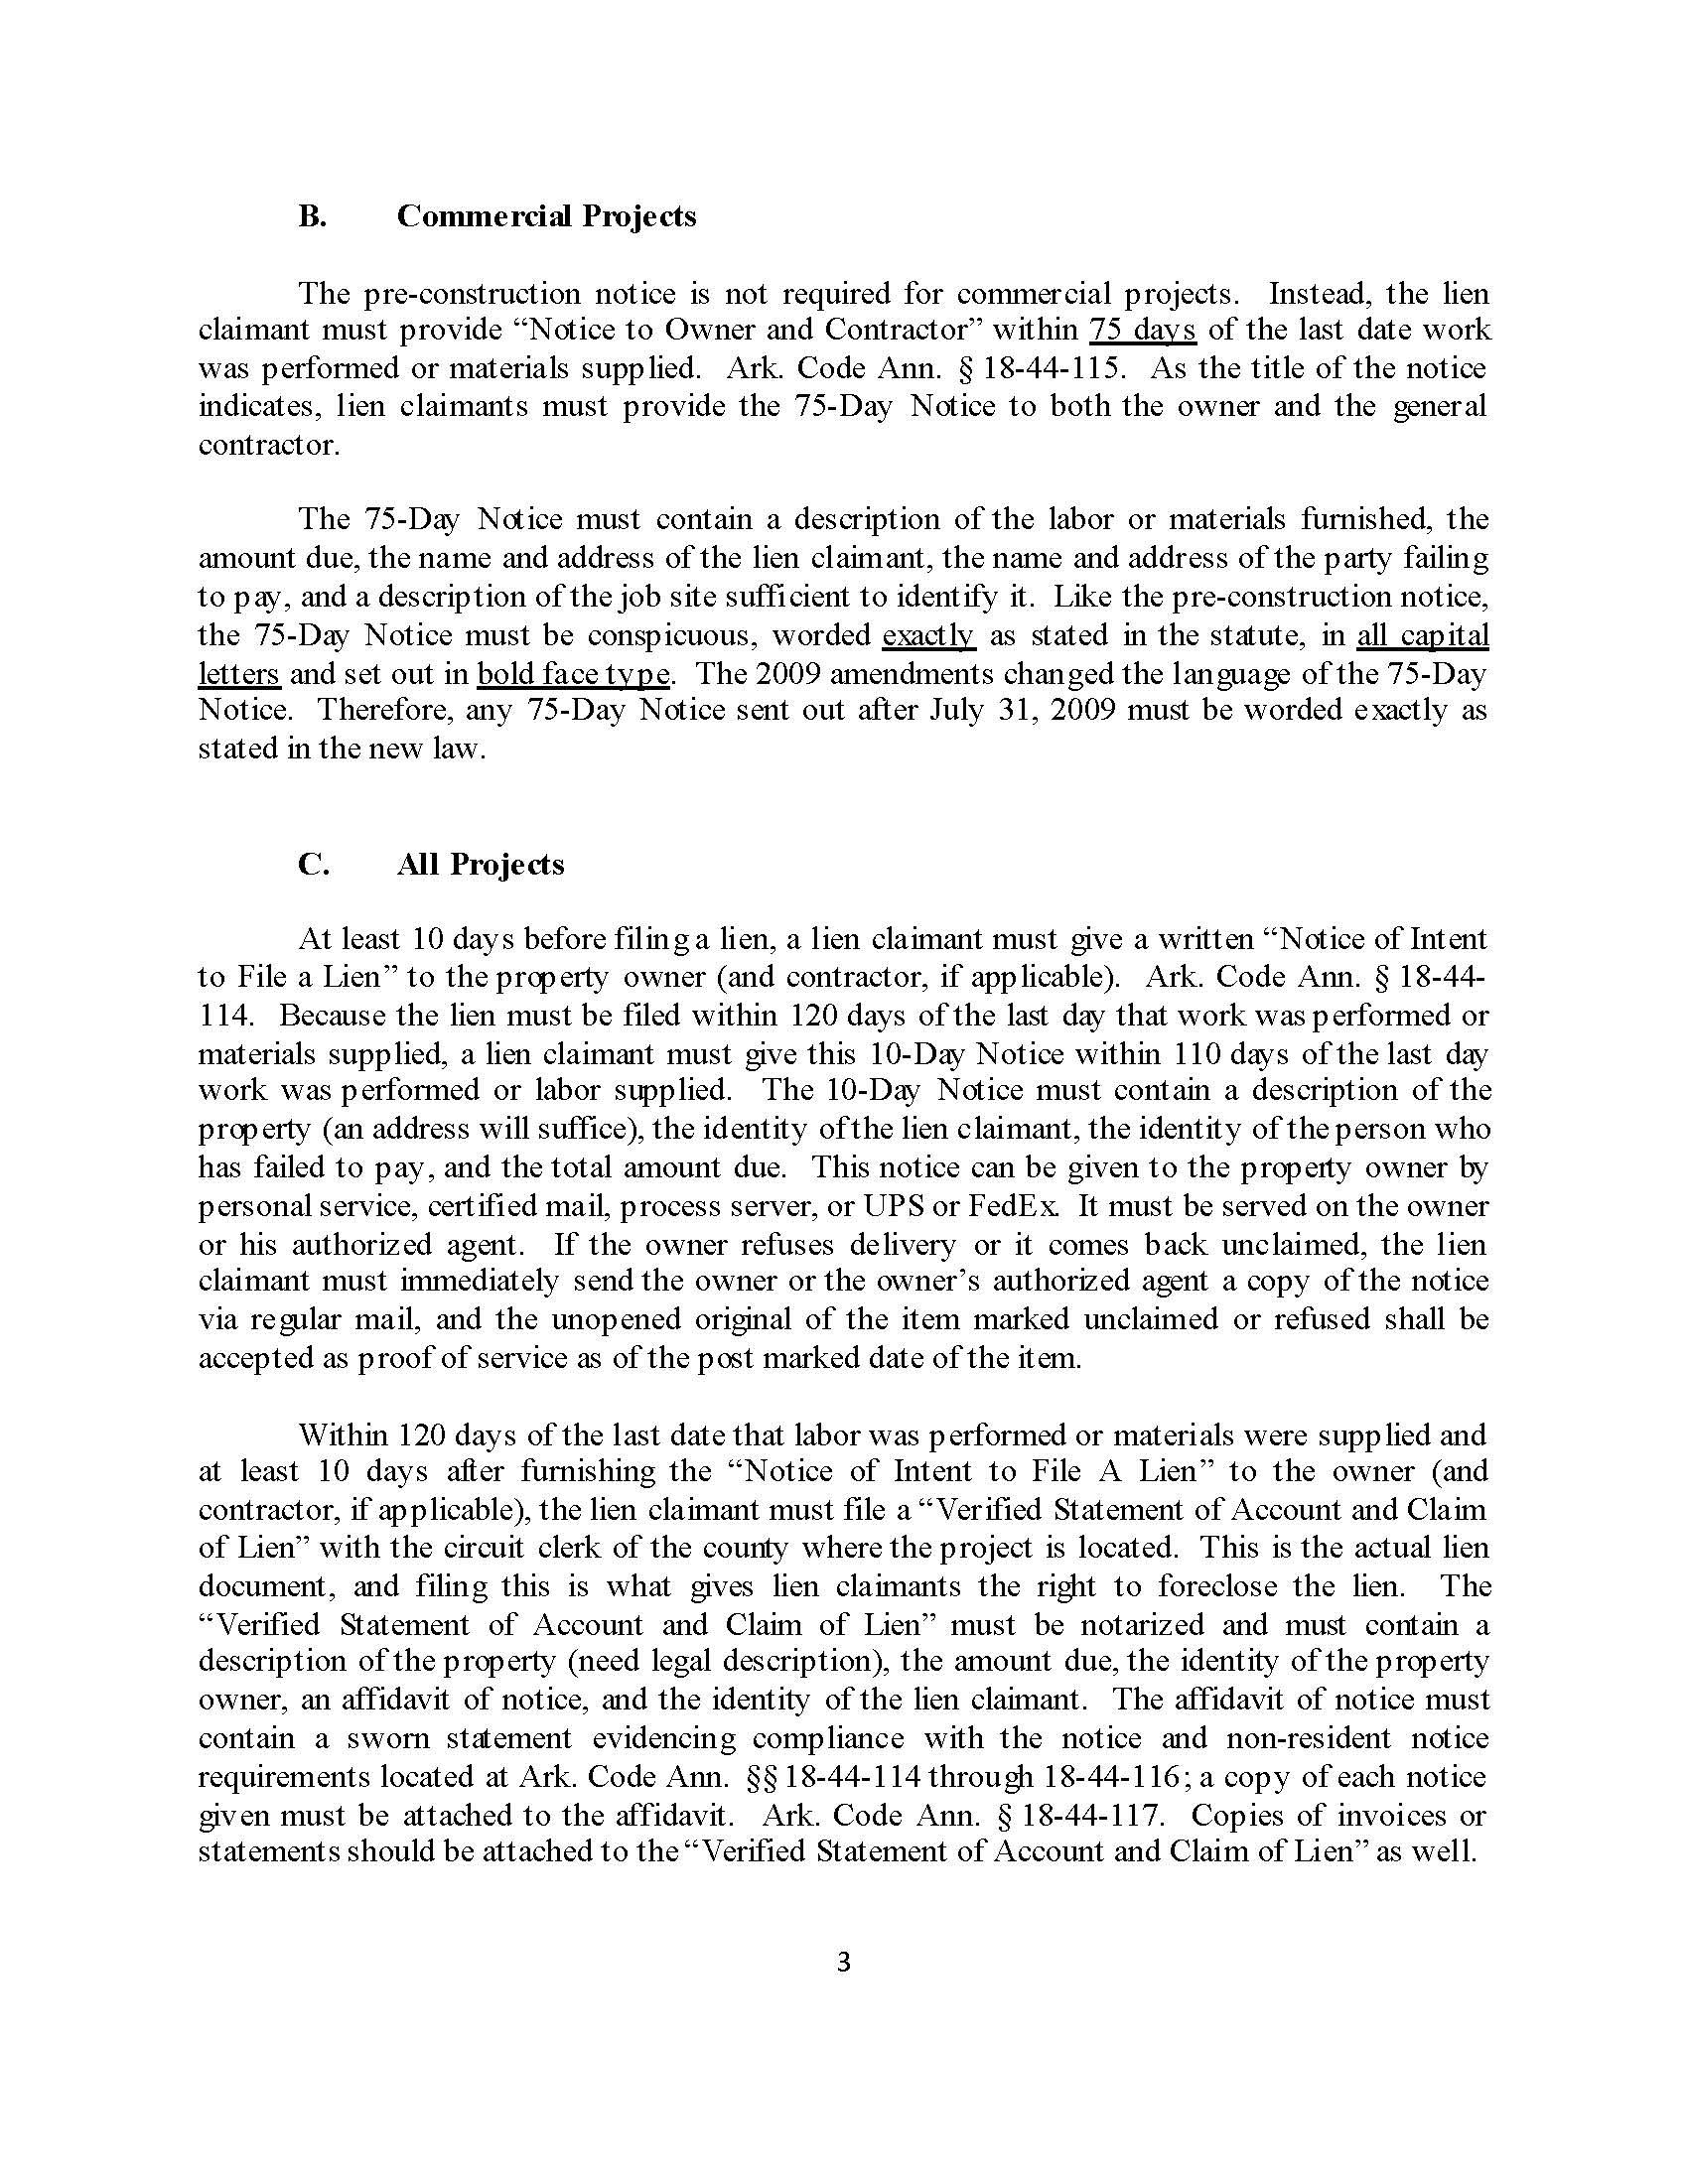 Summary-Materialman-Lien-Statutes-and-Amendments-faulkner-2011_Page_3.jpg